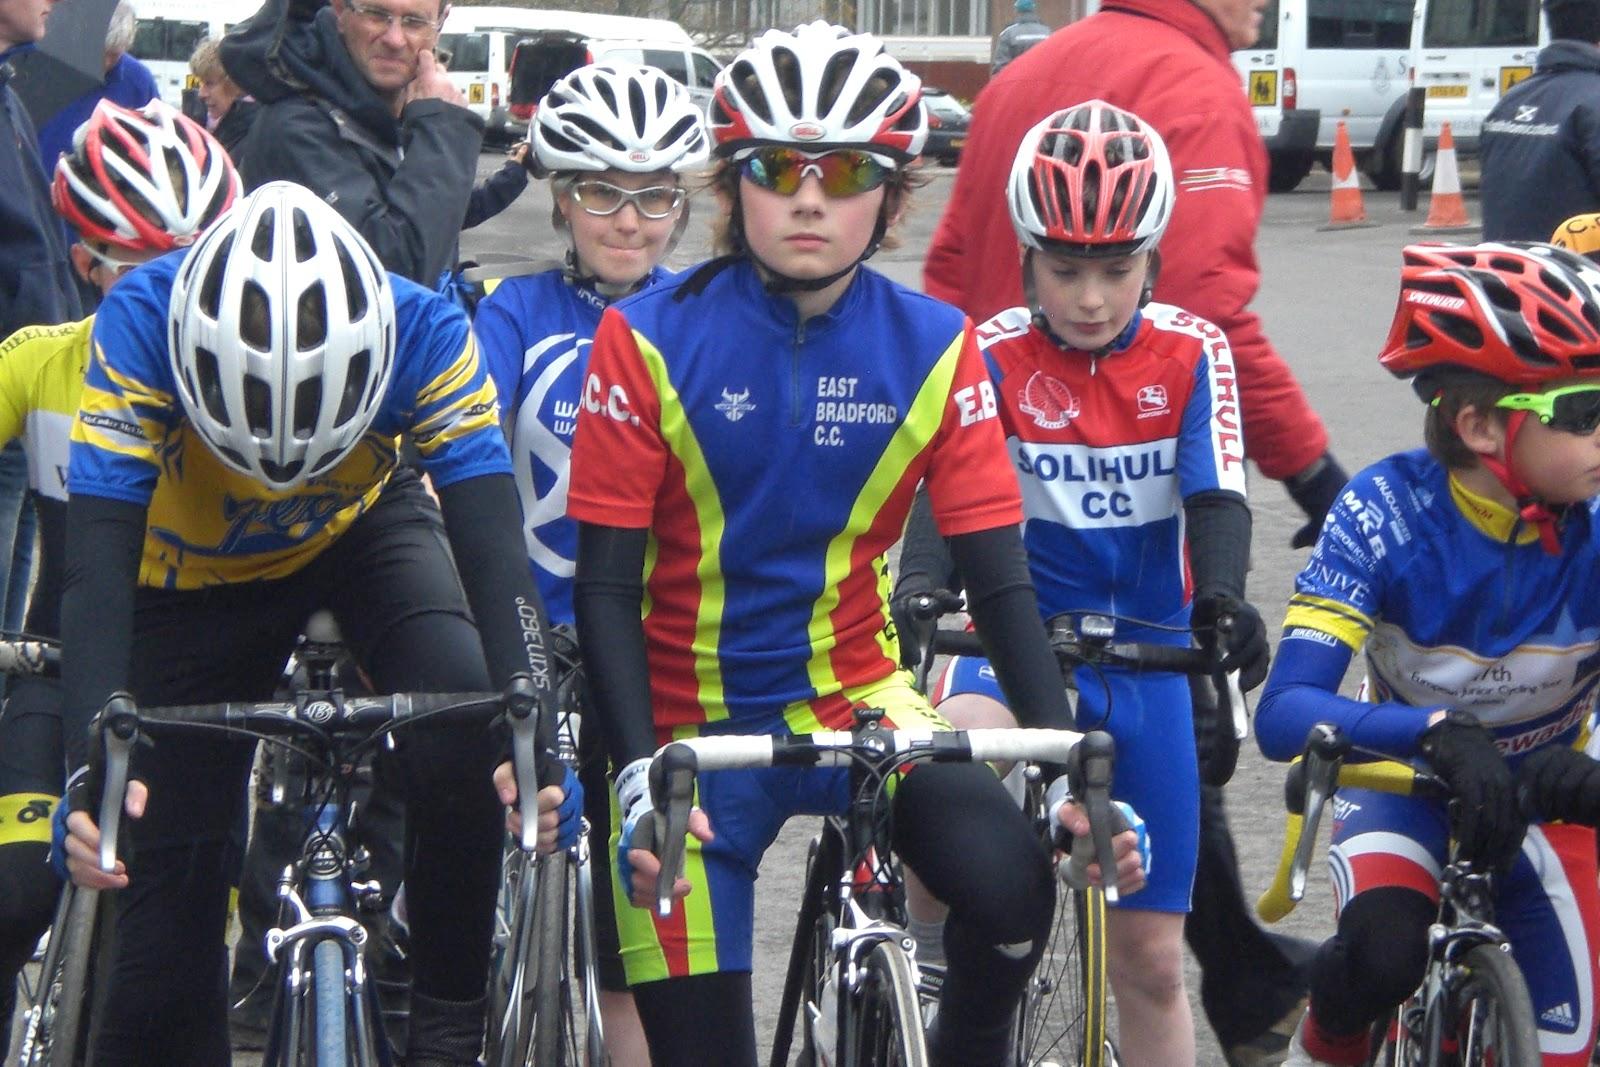 east bradford cycling club kids saturday bike club euan cameron